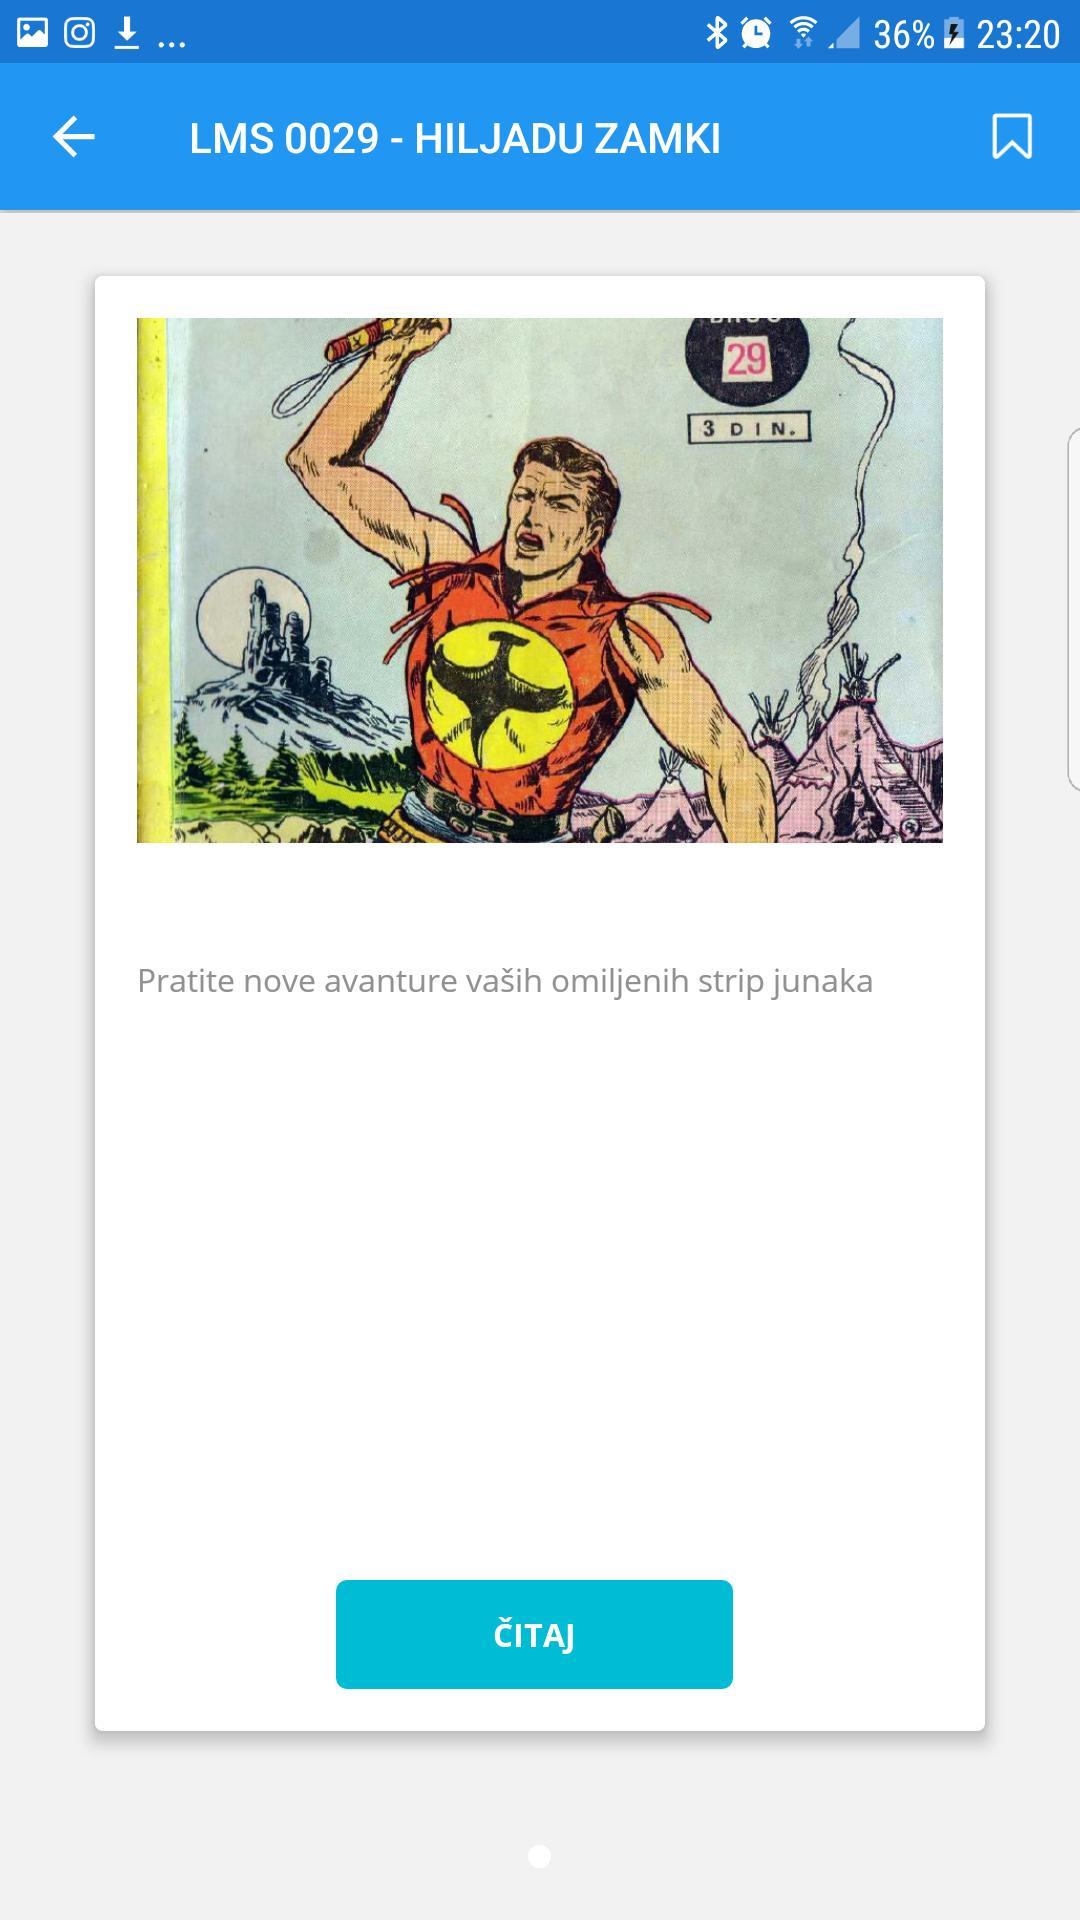 STRIPOVI - revije (Biser strip, Stripoteka, Strip art